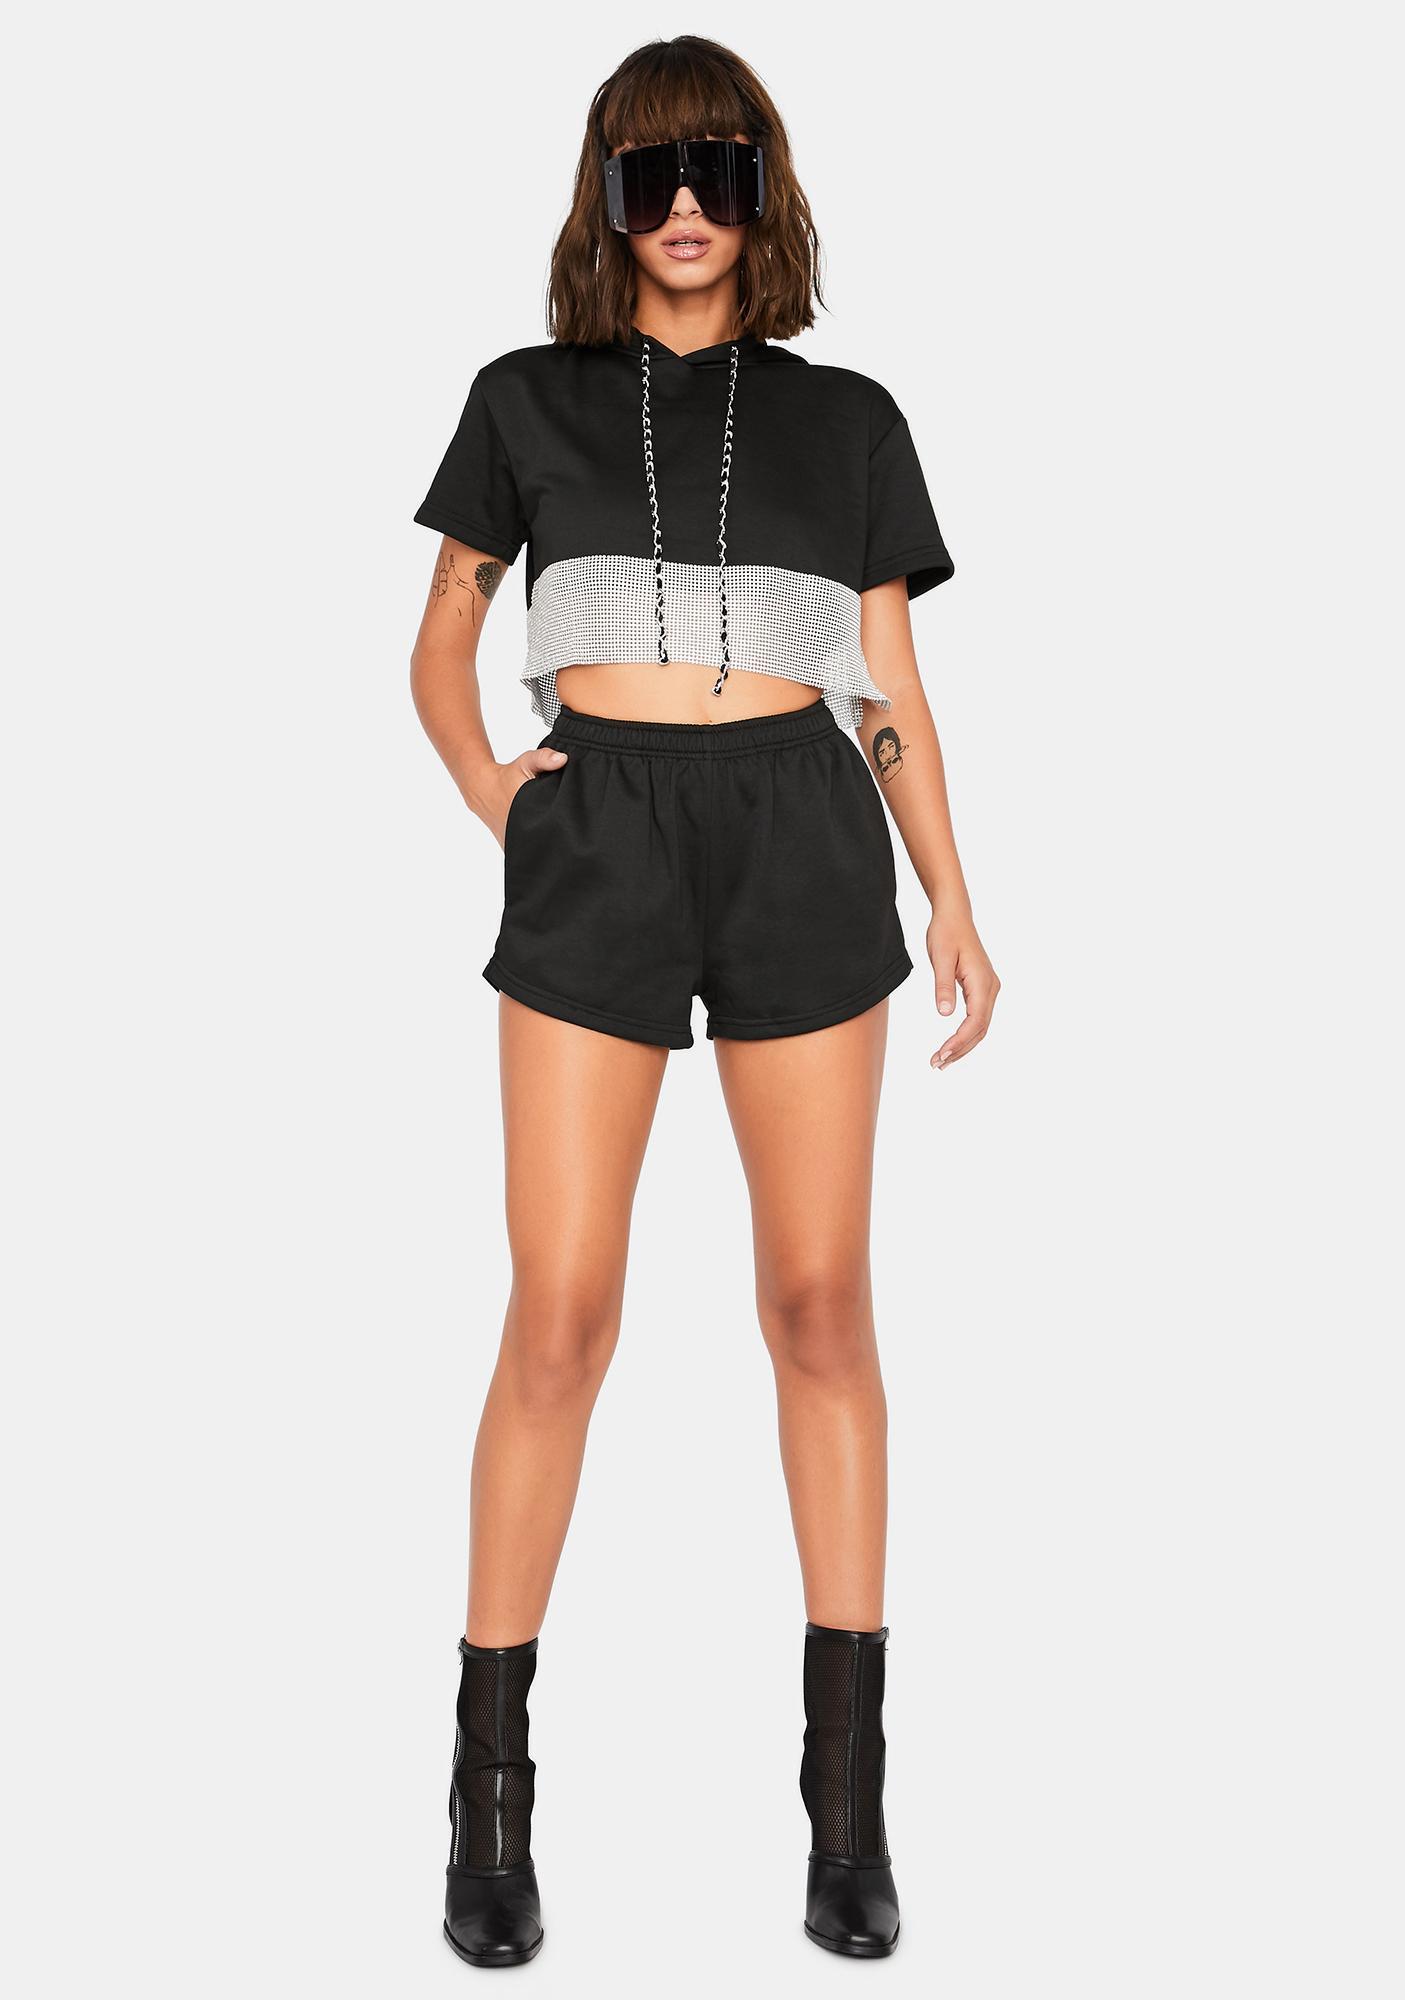 Bold Bling Shorts Set